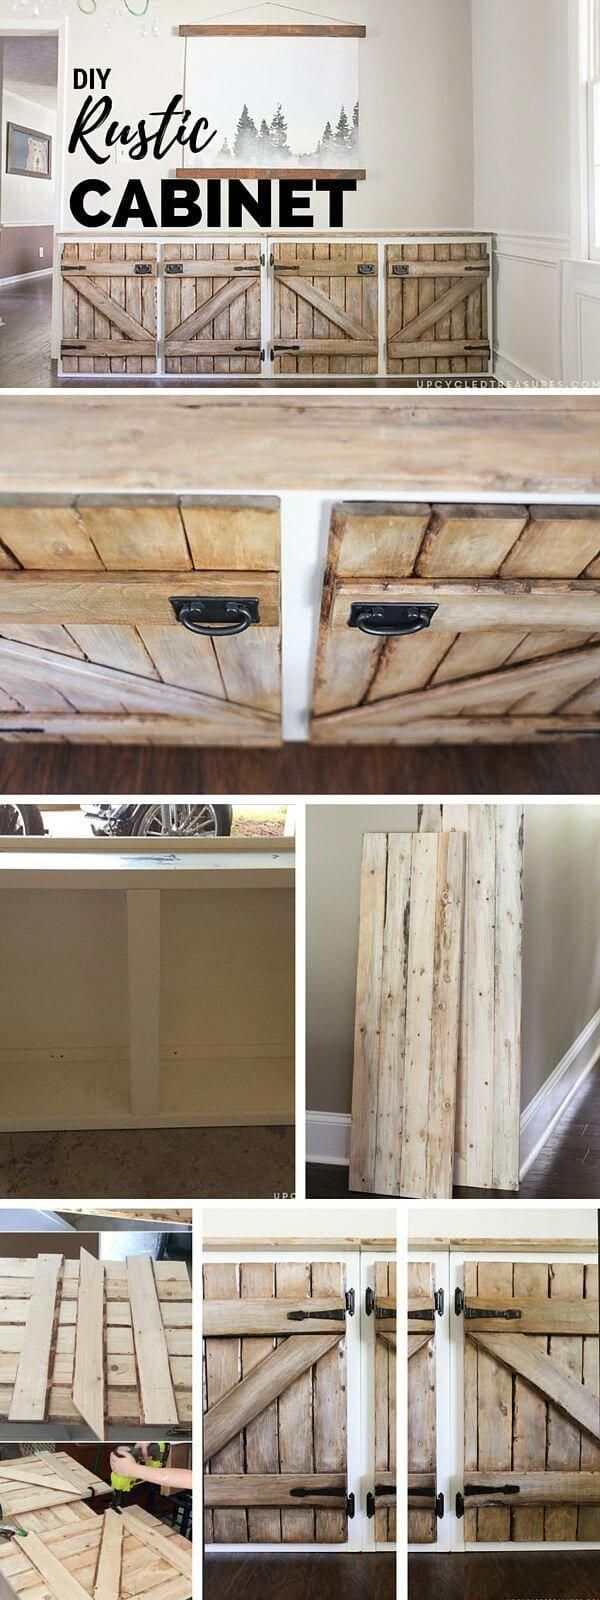 Rustically Repurposed Barn Door Cabinet # ...